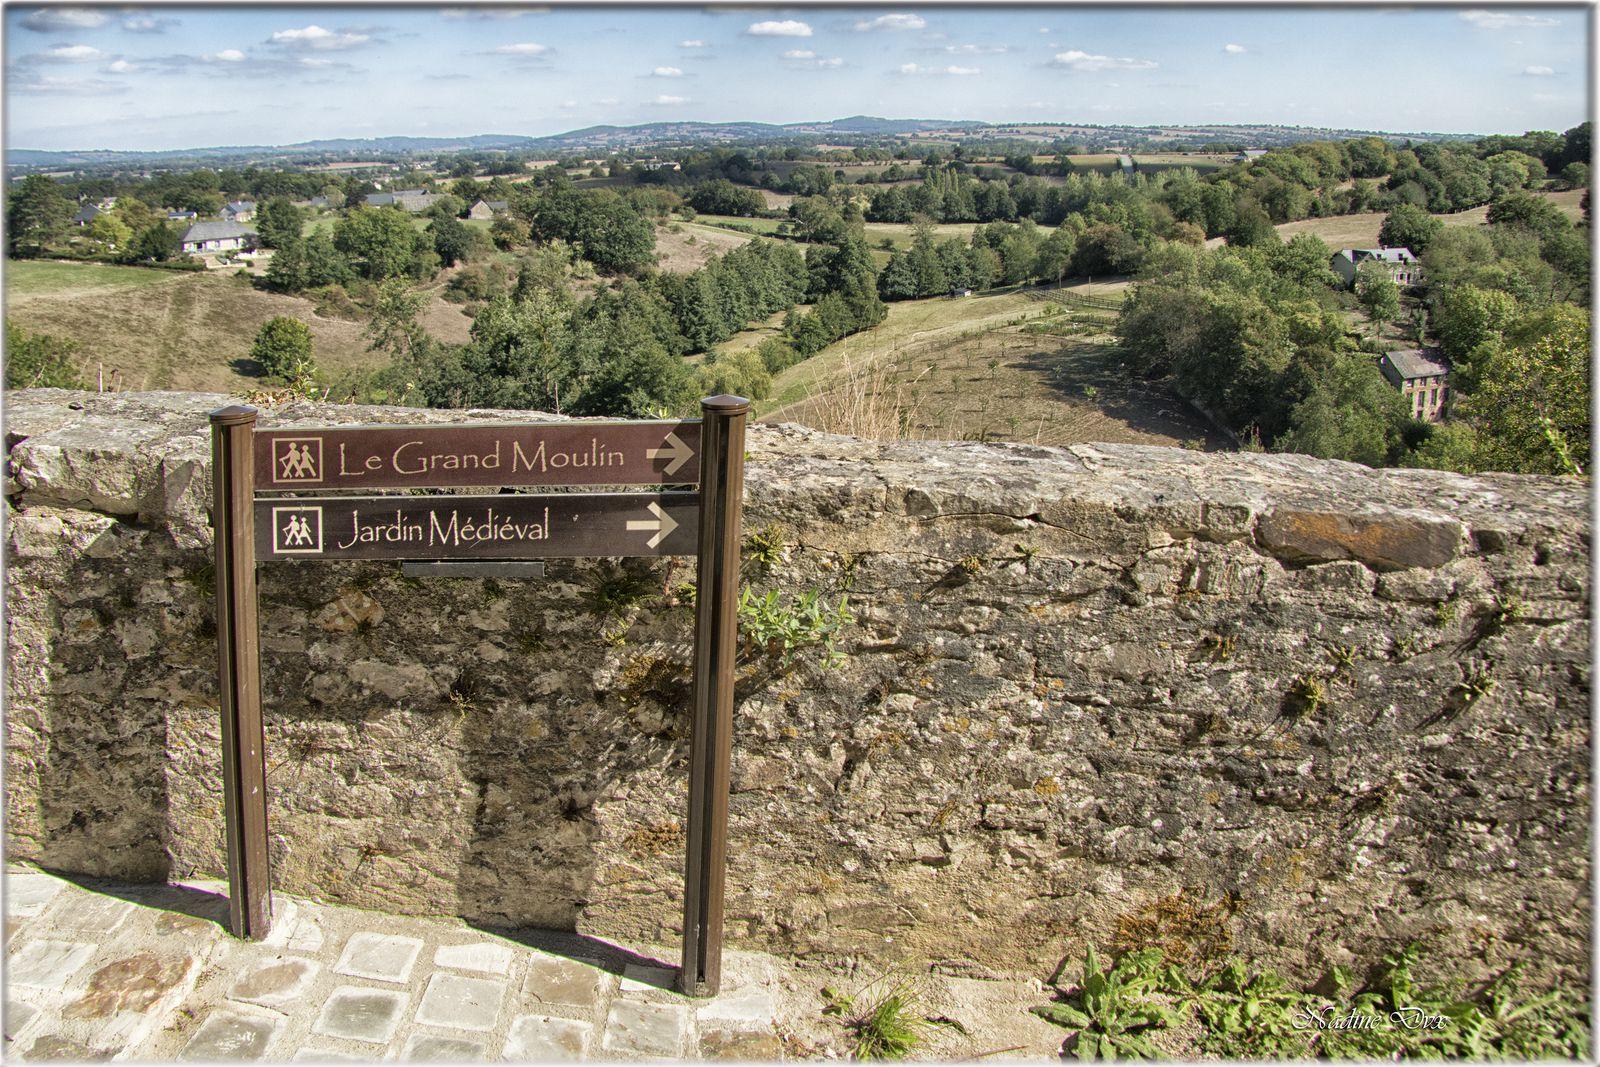 Chemin de ronde site de Sainte-Suzanne - Mayenne